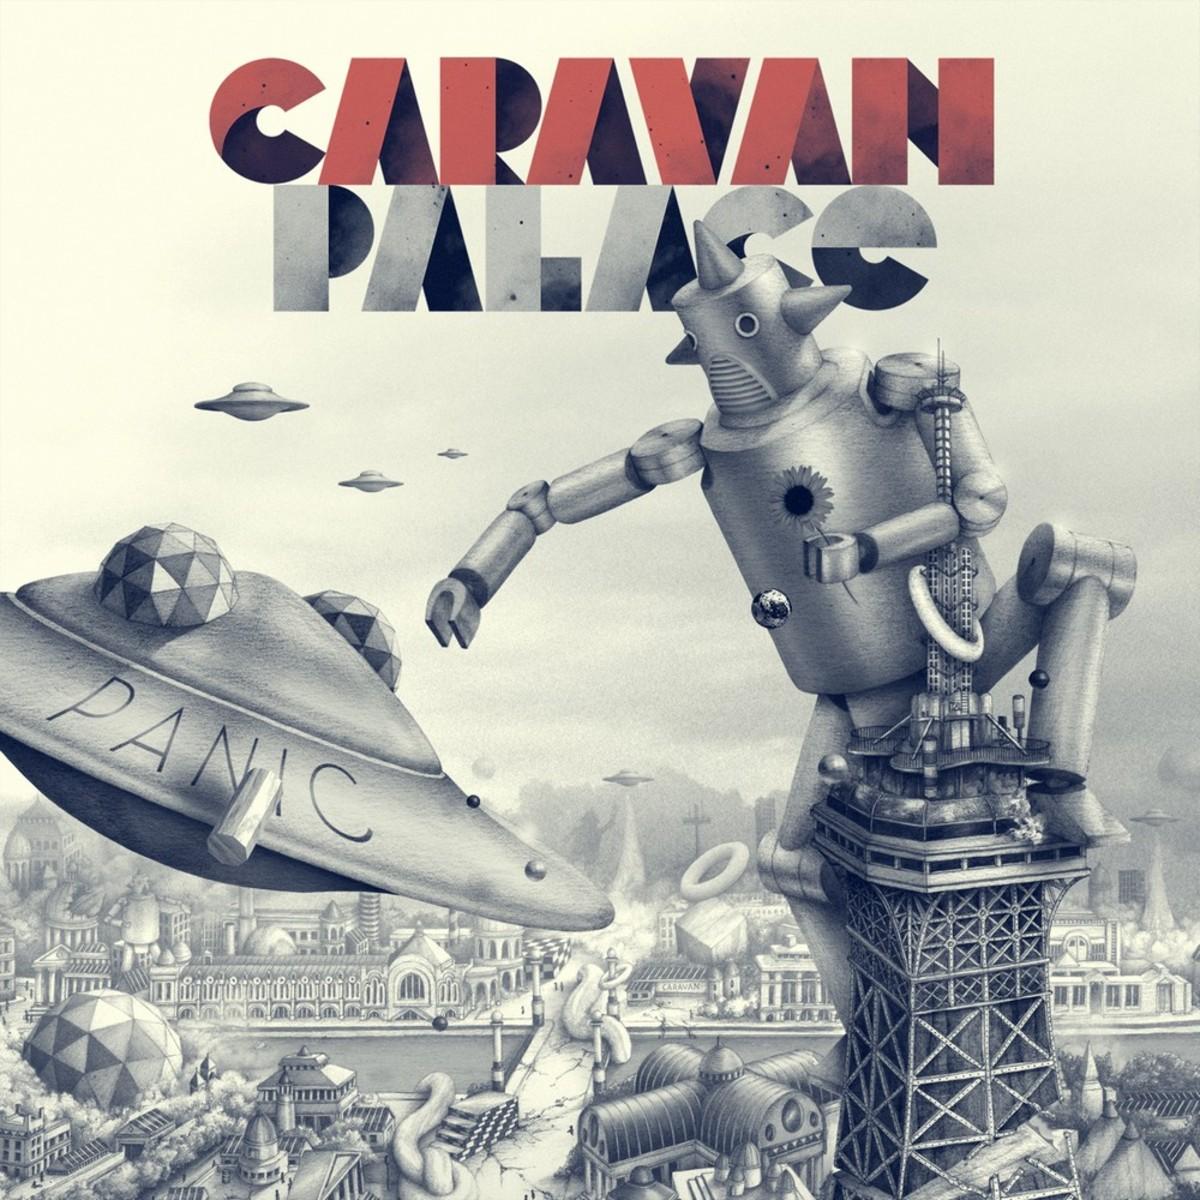 Cover art to Caravan Palace's 2012 electro swing album Panic.